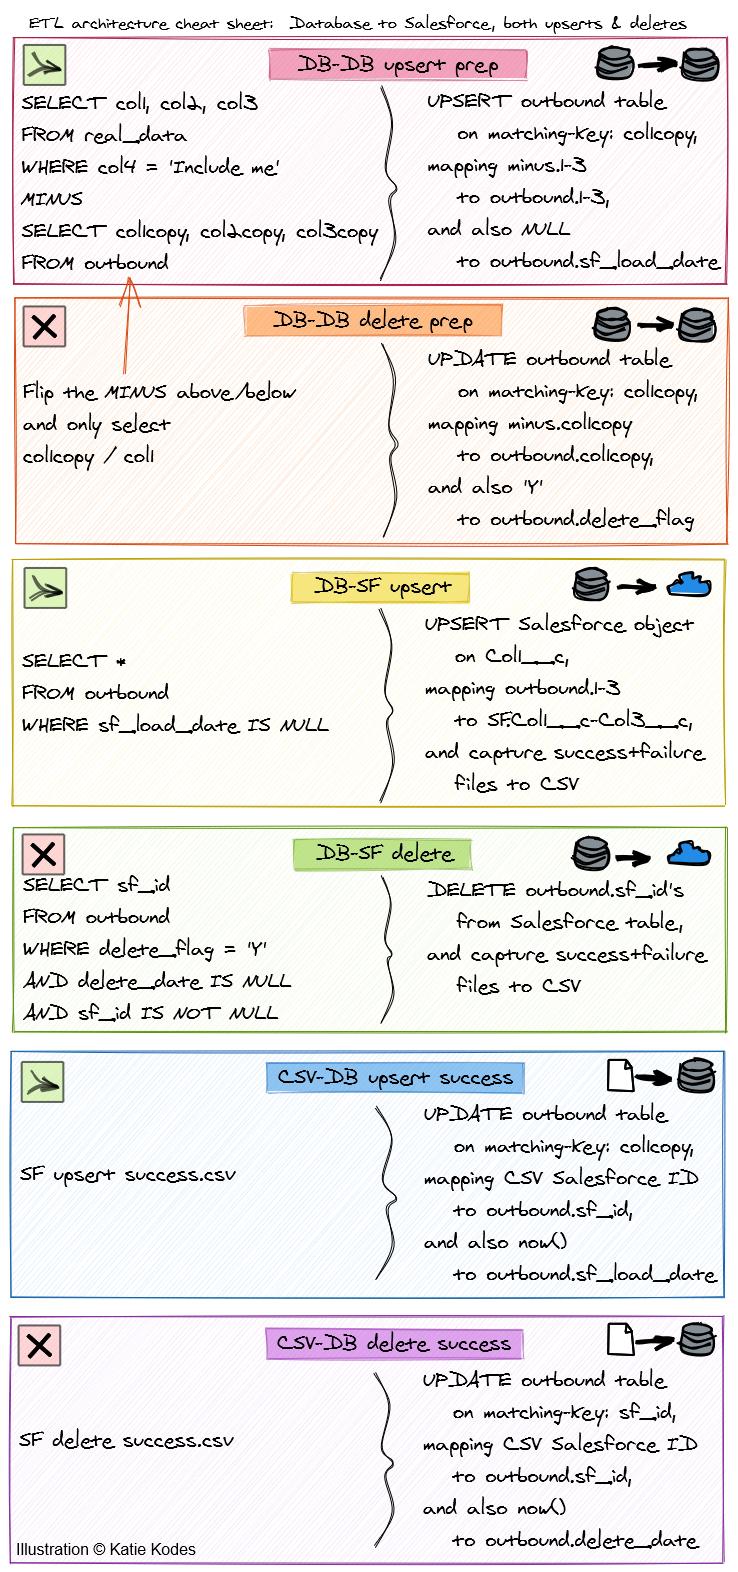 Cheat sheet style summary of post